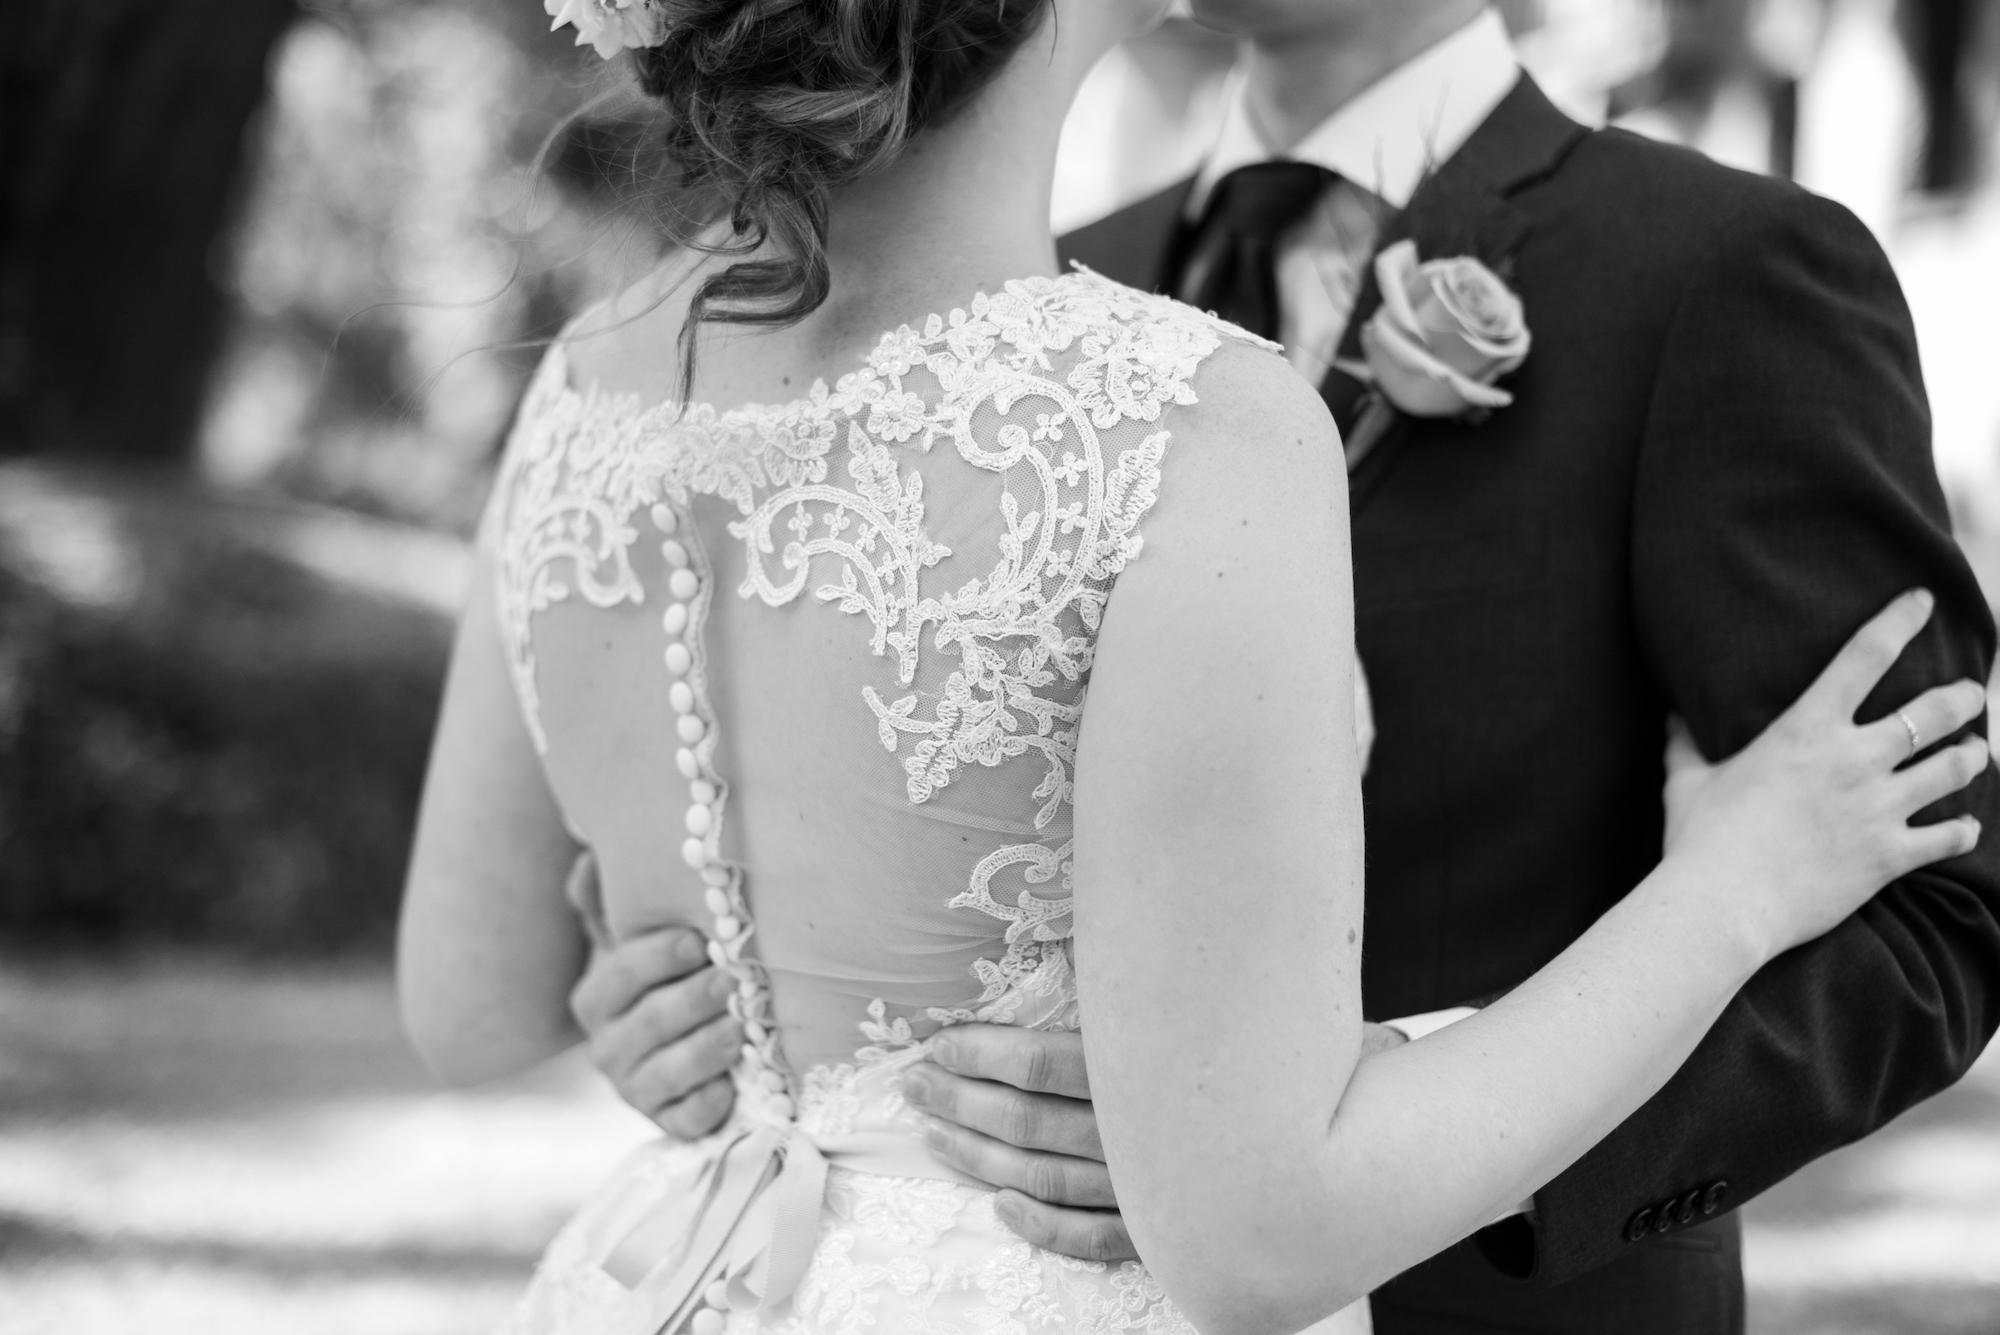 st-augustine-photographers-st-augustine-wedding-photographer-sarah-annay9.jpg